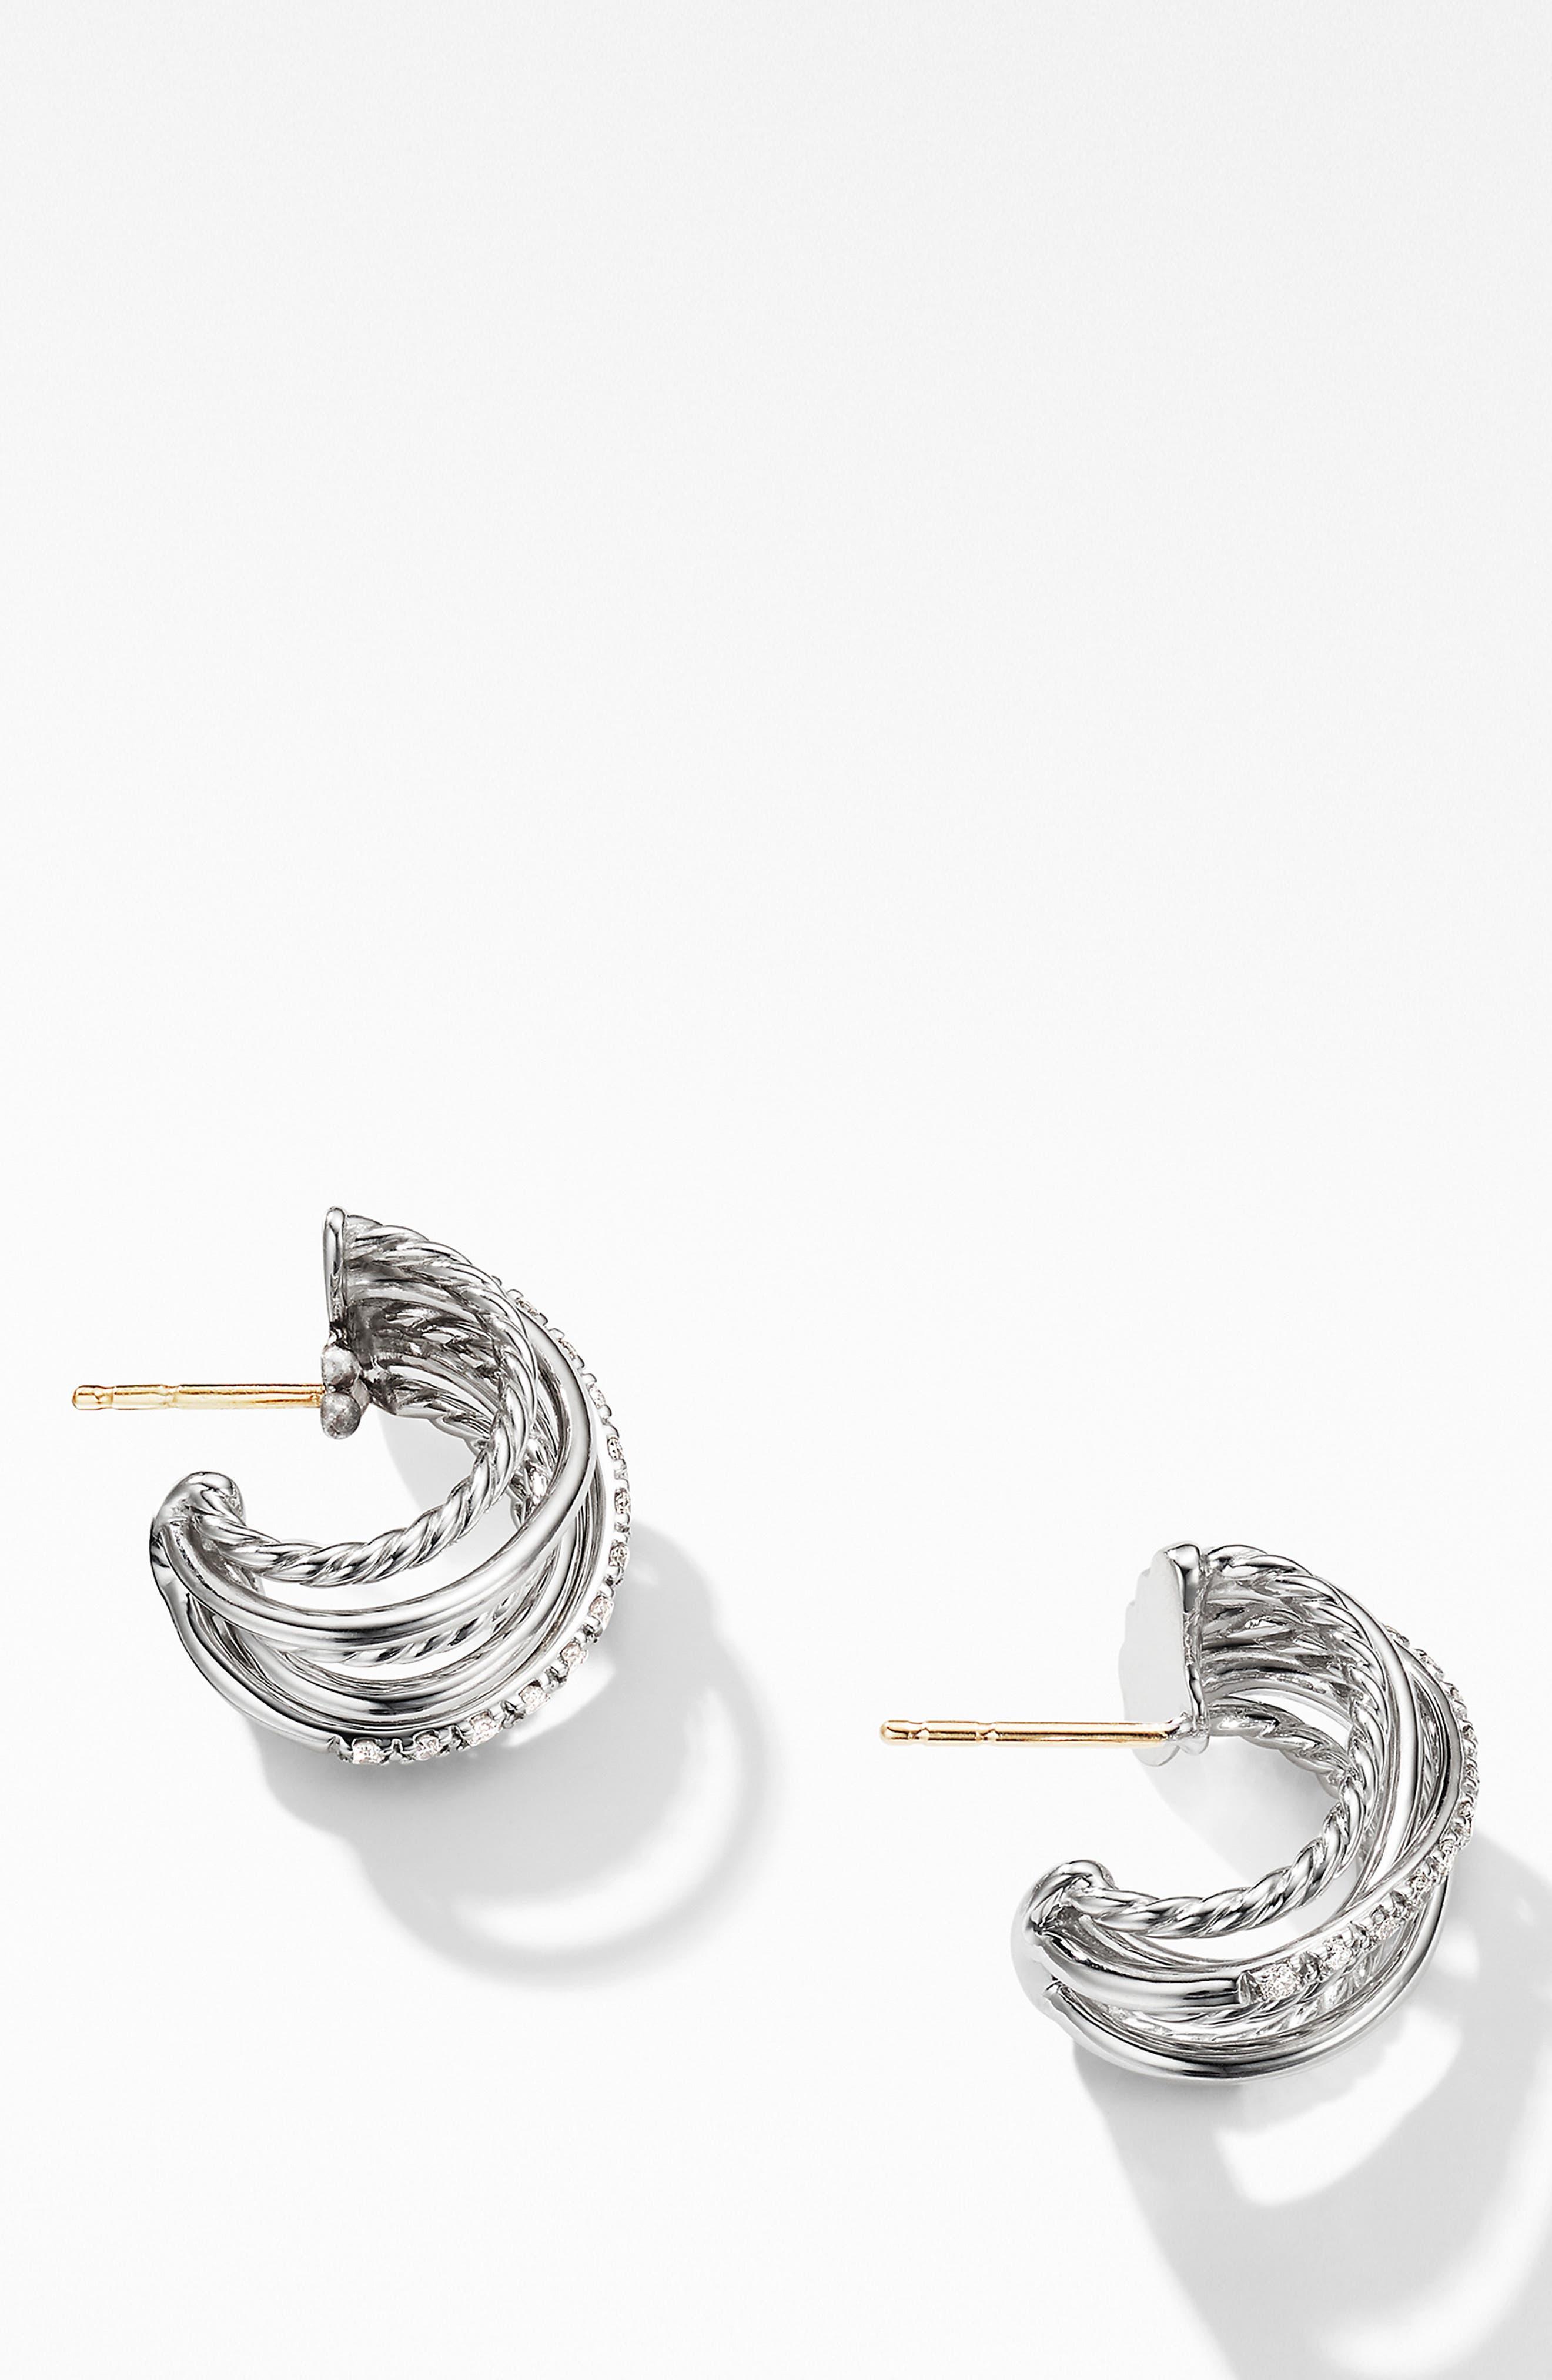 DAVID YURMAN, Crossover Huggie Hoop Earrings with Diamonds, Alternate thumbnail 2, color, SILVER/ DIAMOND